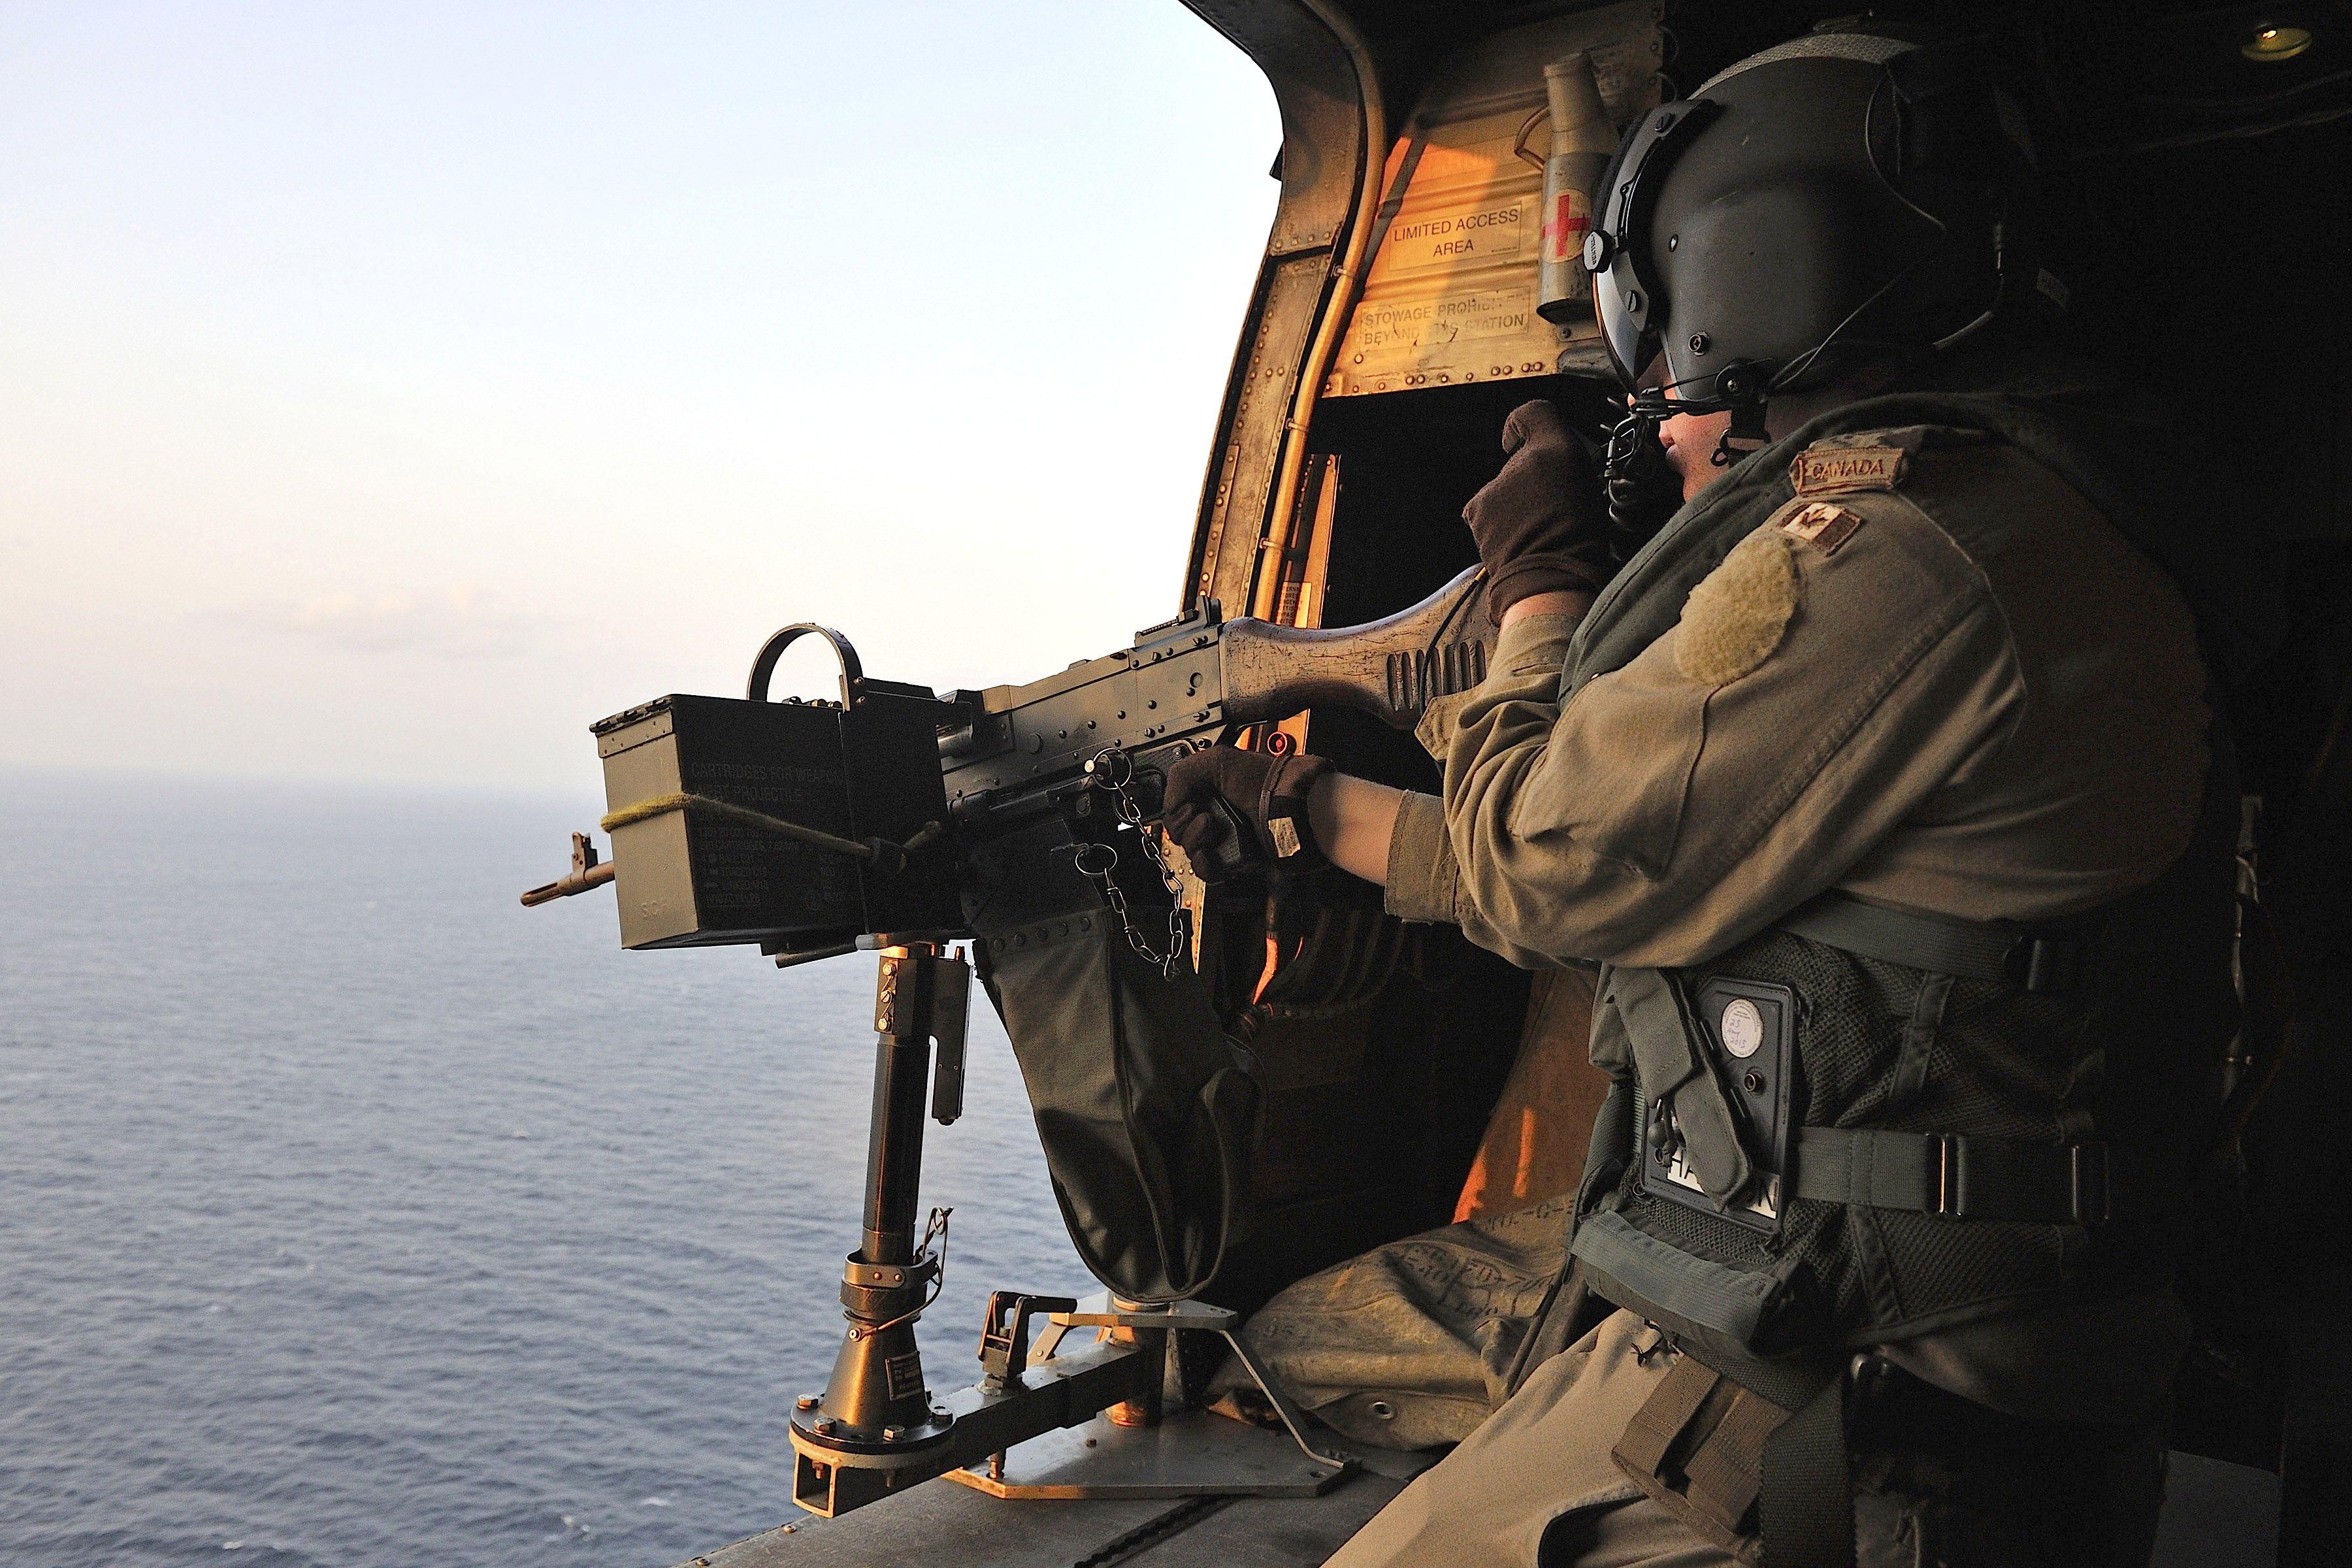 Corporal Andrew Harton fires a C6 general purpose machine